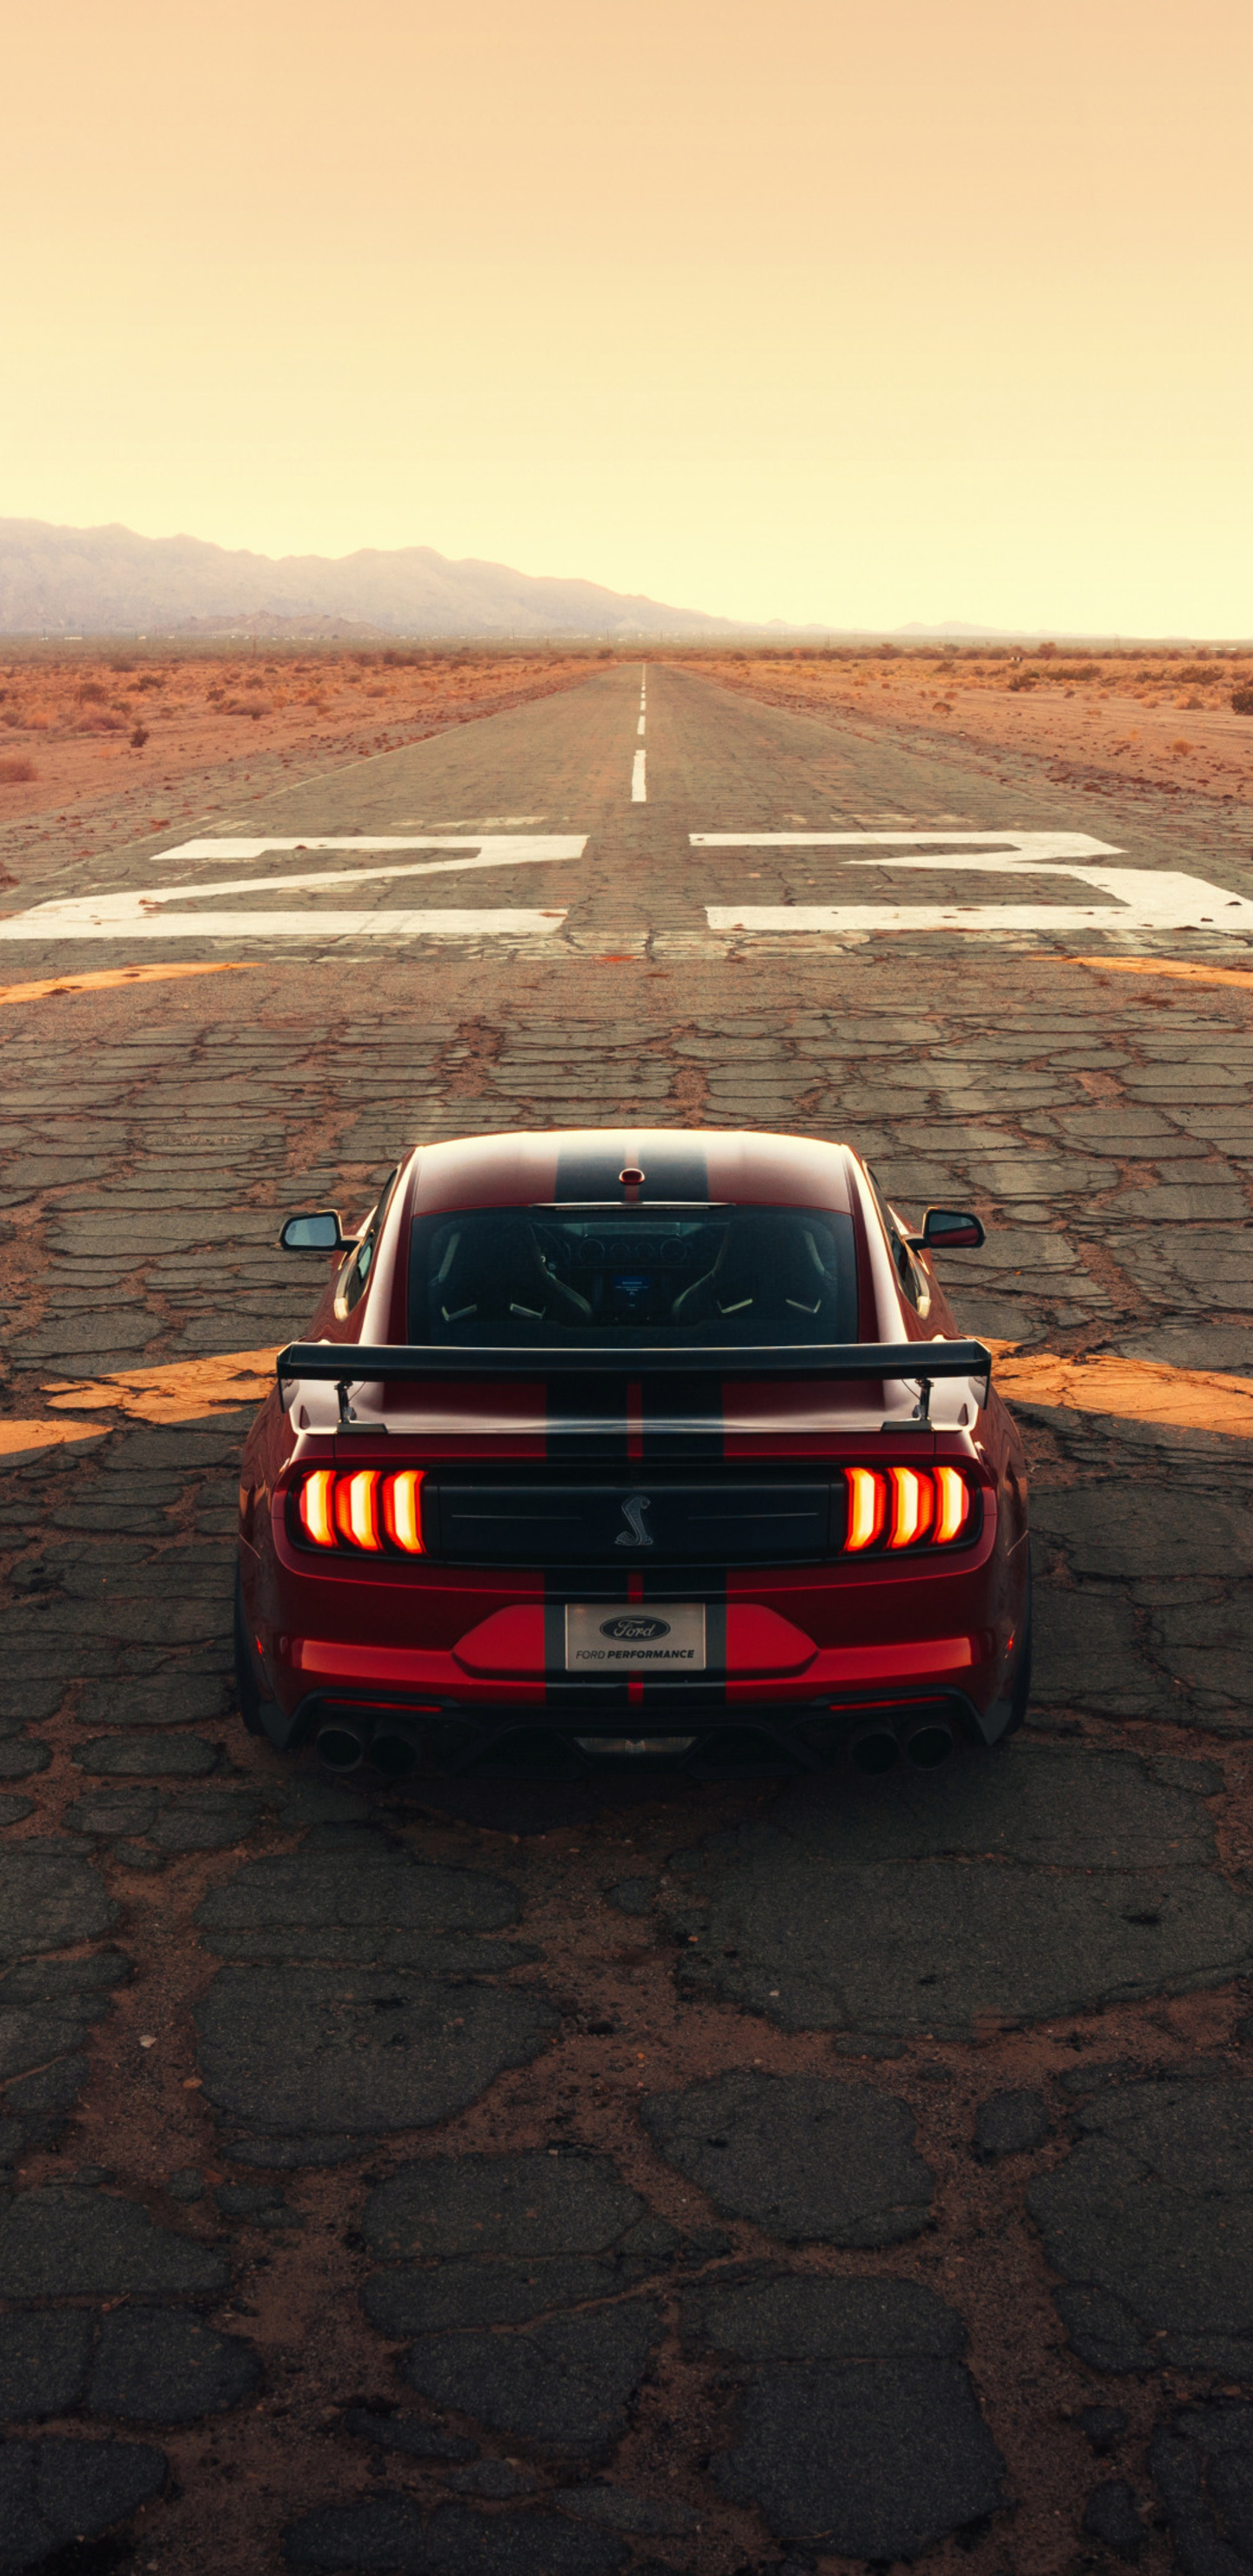 1440x2960 Ford Mustang Shelby Gt500 Drag 4k Samsung Galaxy ...